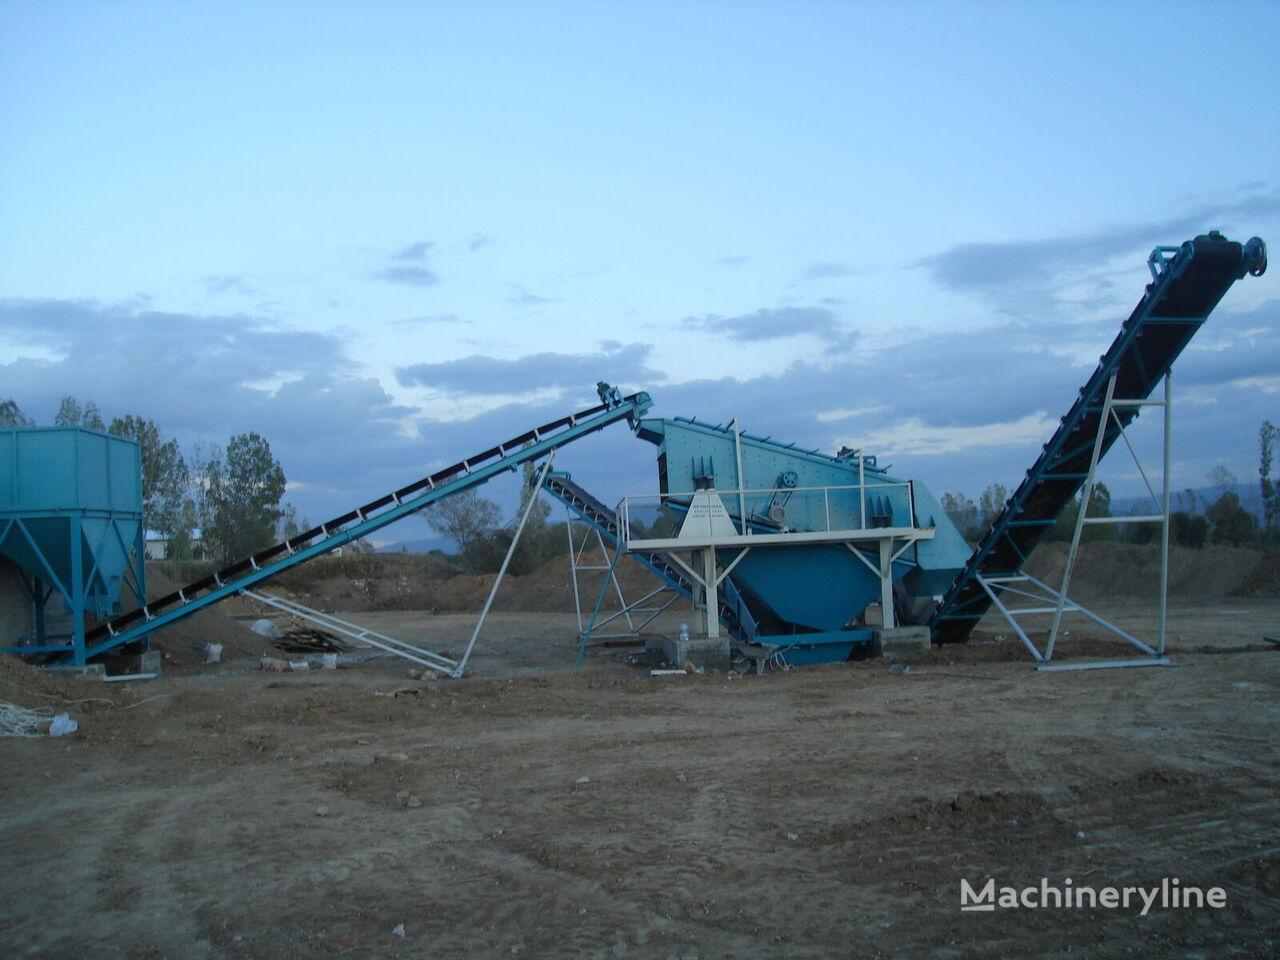 ny POLYGONMACH 150 tons per hour stationary crushing, screening, plant knuseverket